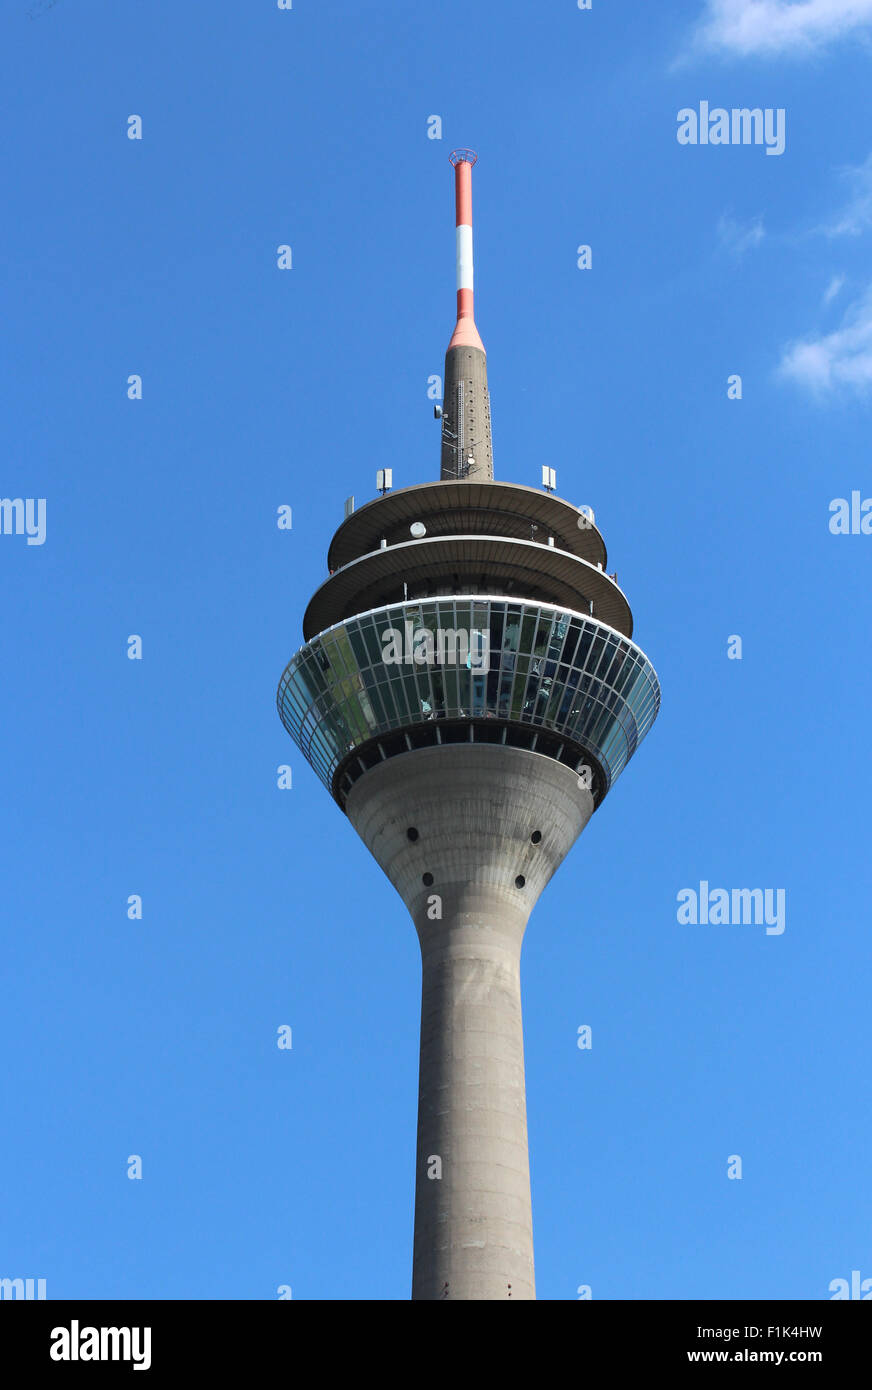 Fernsehturm Düsseldorf - Stock Image